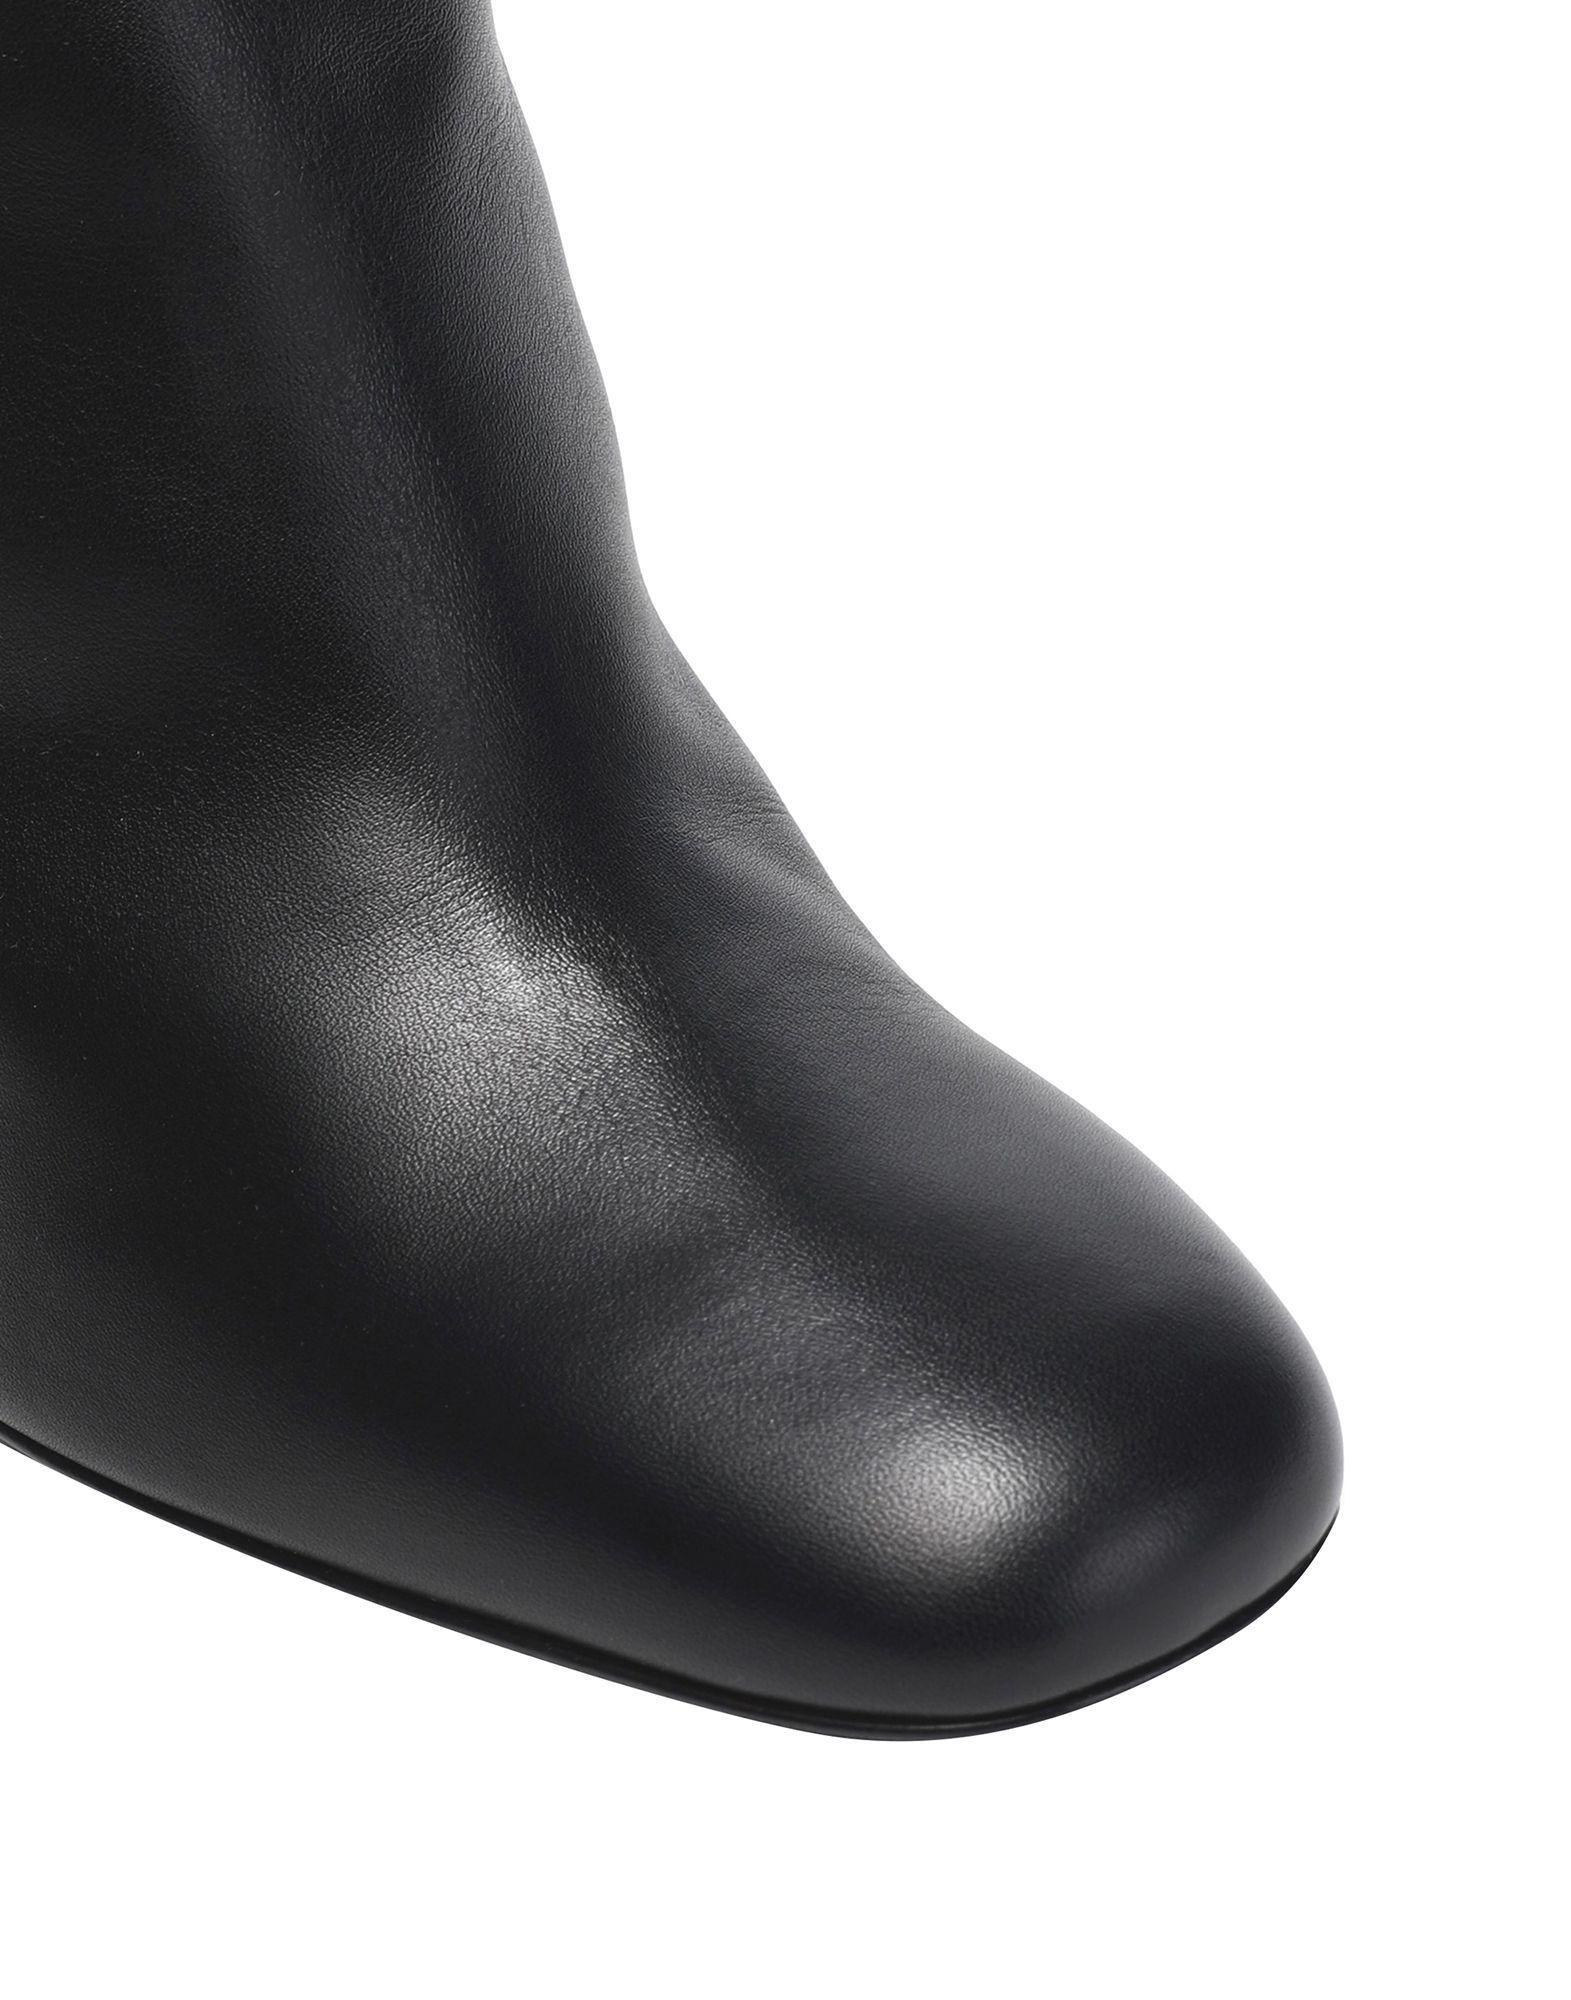 Roger Vivier Women's Boots Black Calf